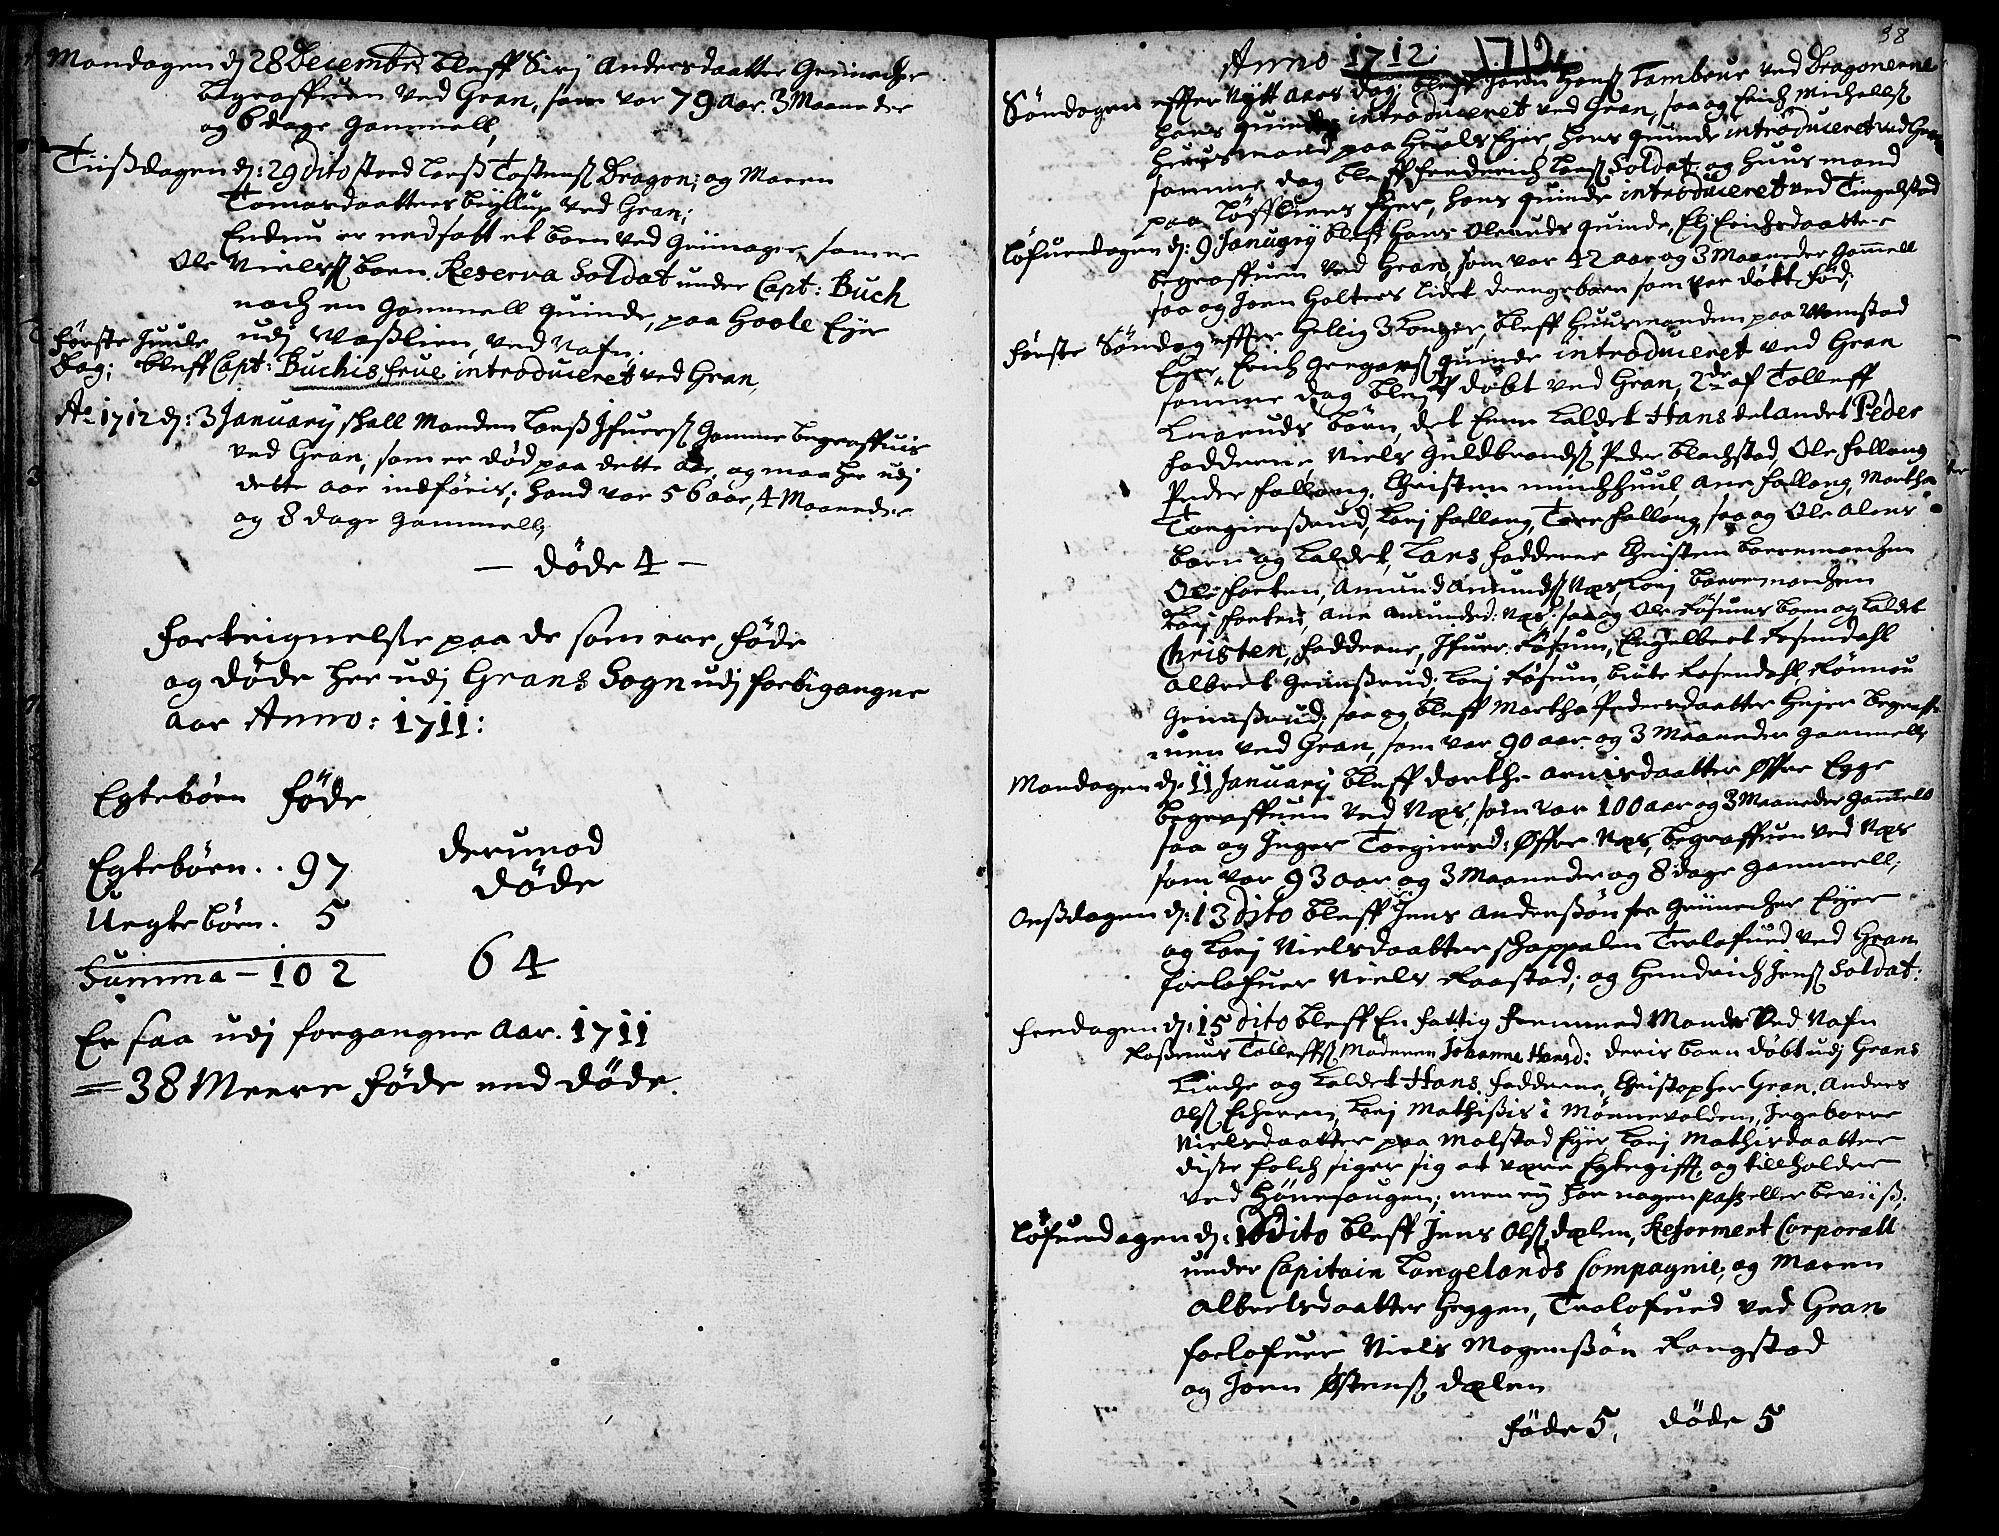 SAH, Gran prestekontor, Ministerialbok nr. 1, 1707-1731, s. 38